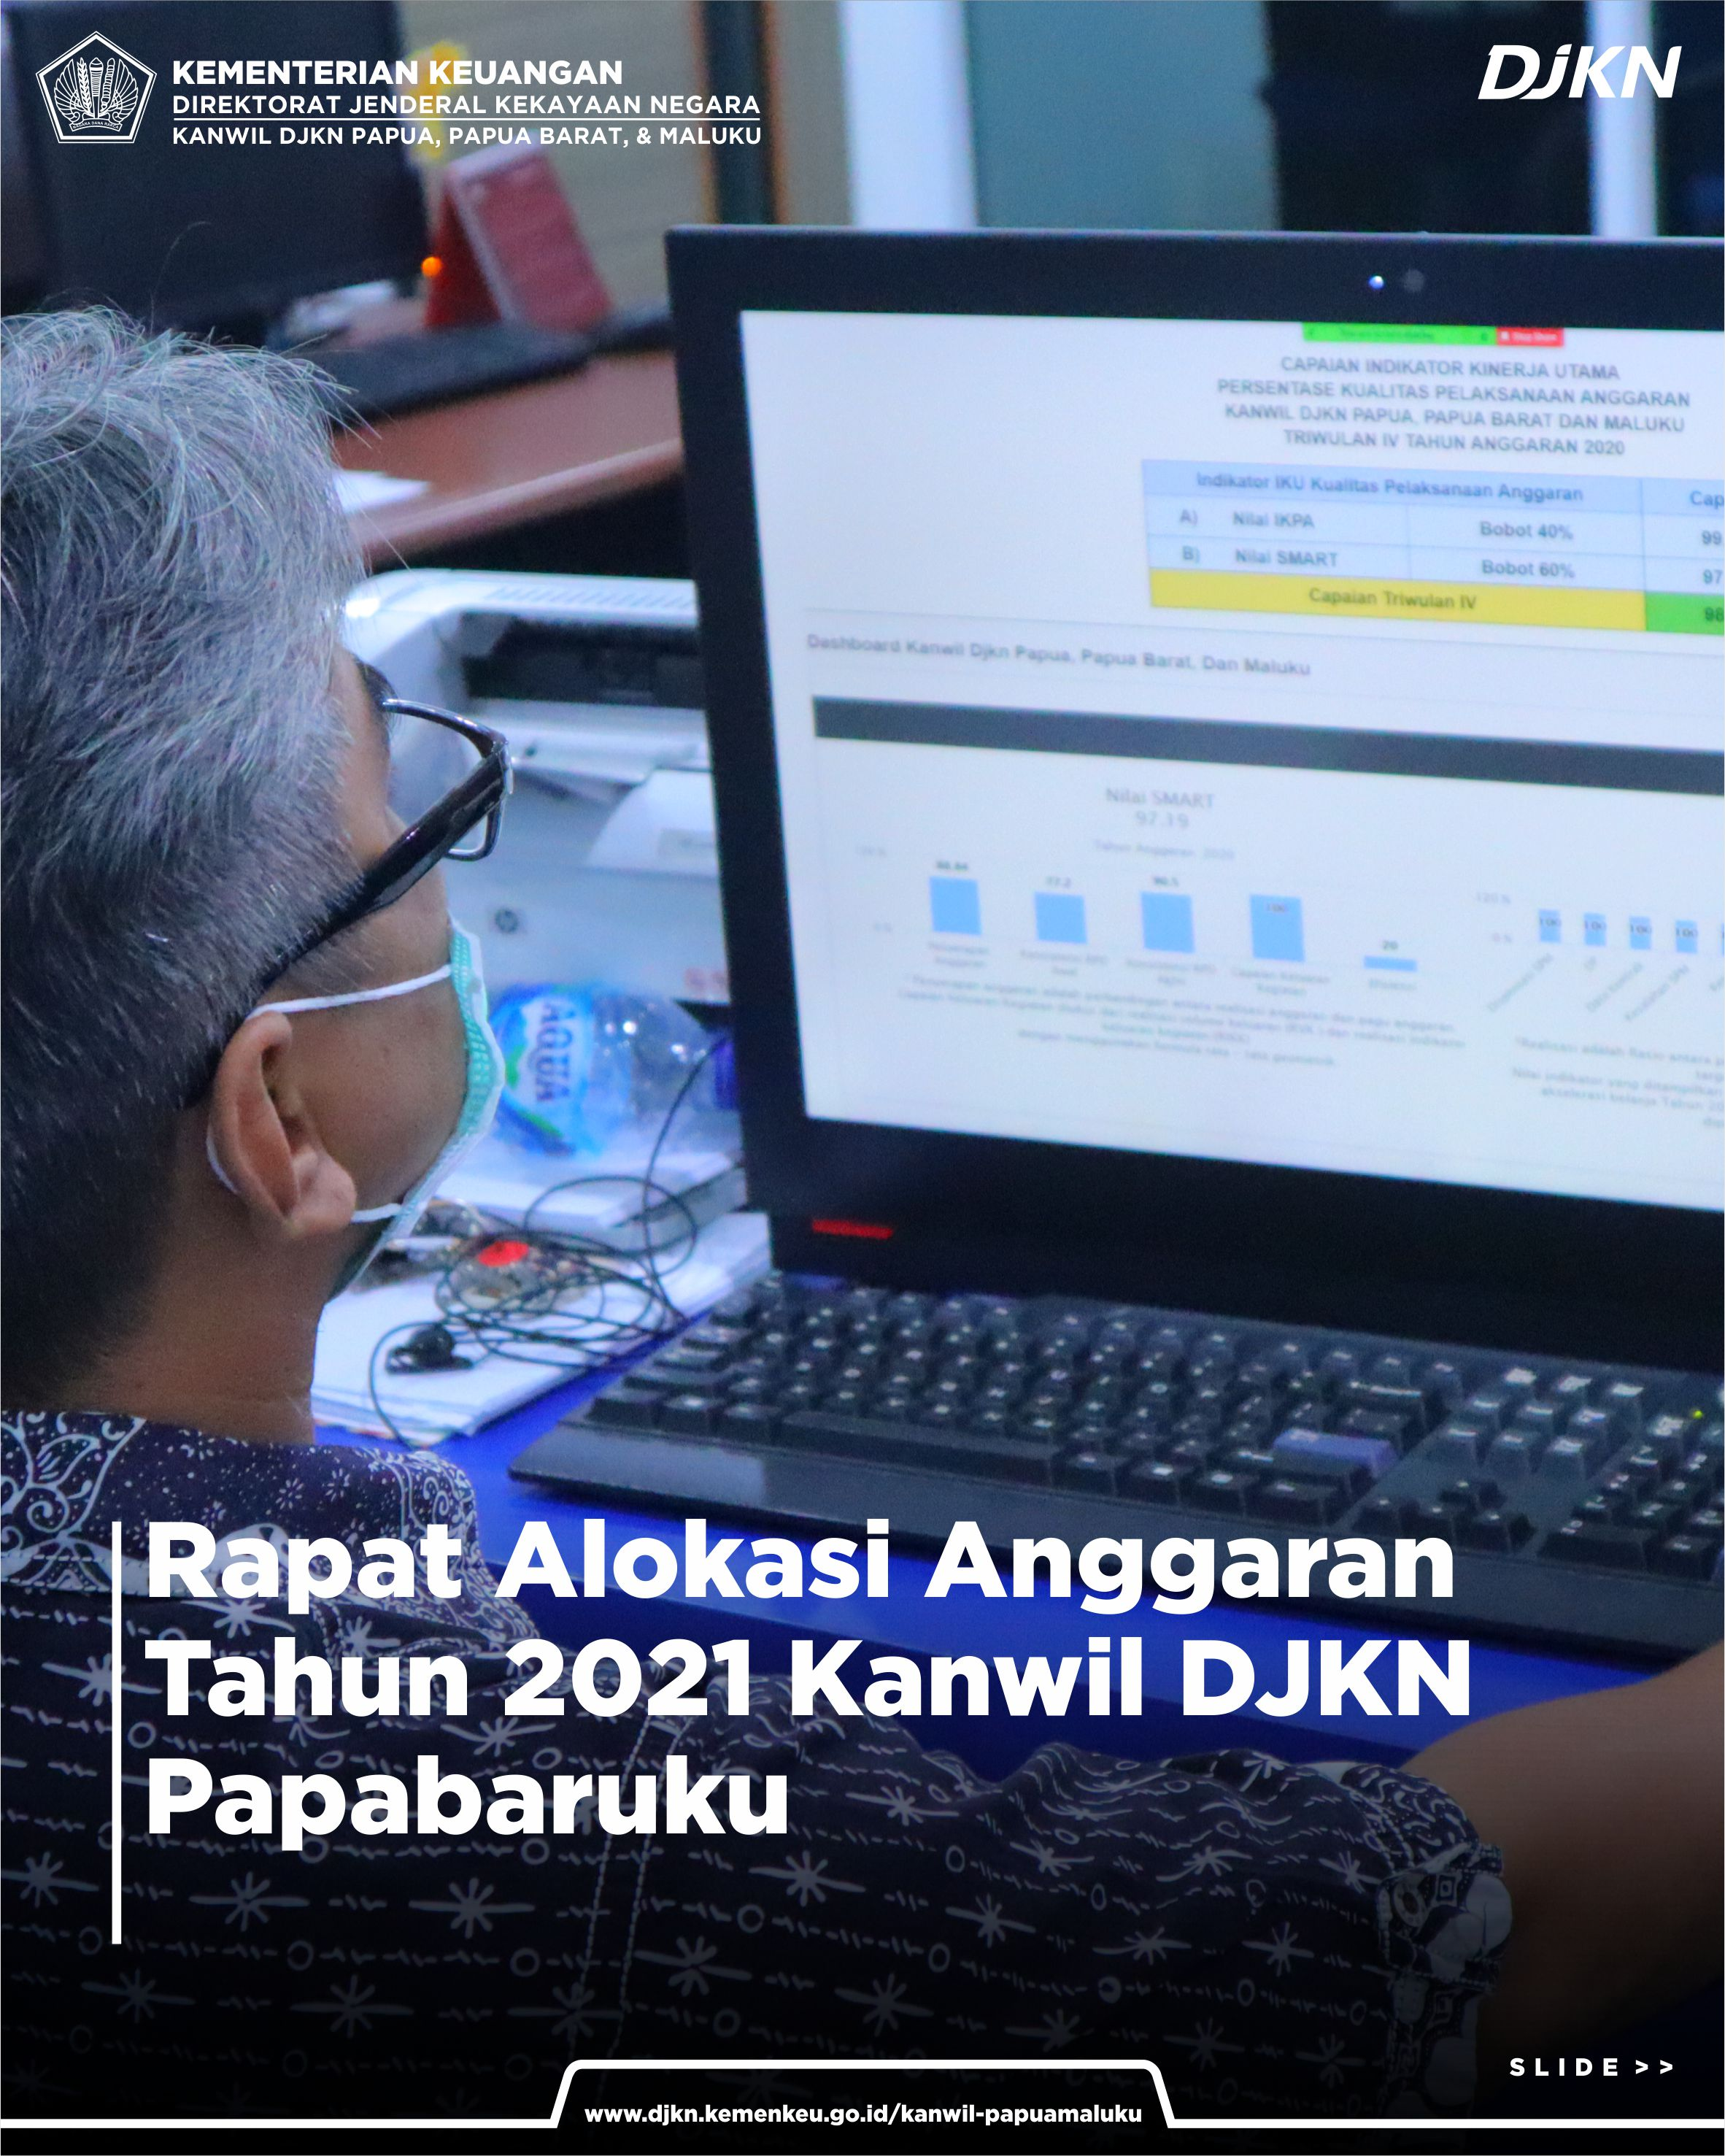 Rapat Alokasi Anggaran Tahun 2021 lingkup Kanwil DJKN Papabaruku